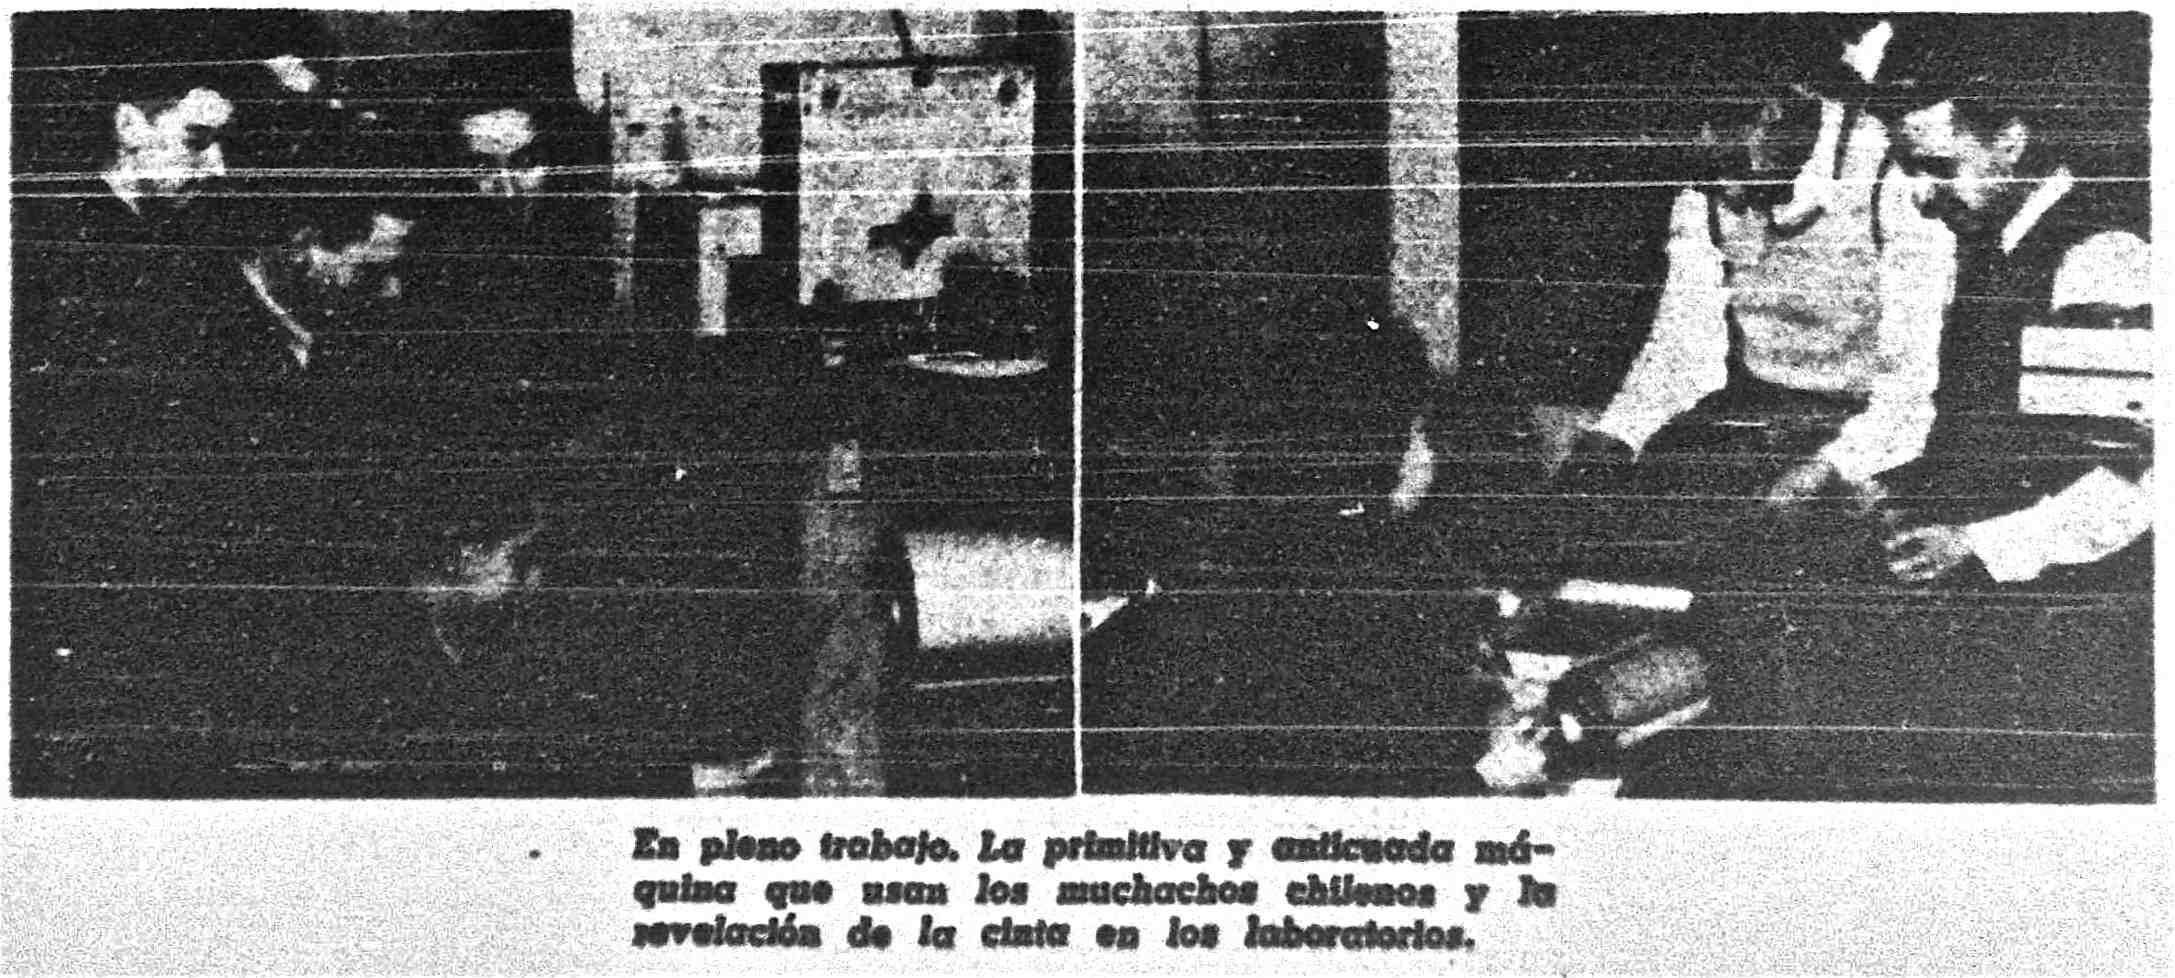 19411008_vea_stgo_Escudero_Trupp_FOTO02_baja.jpg